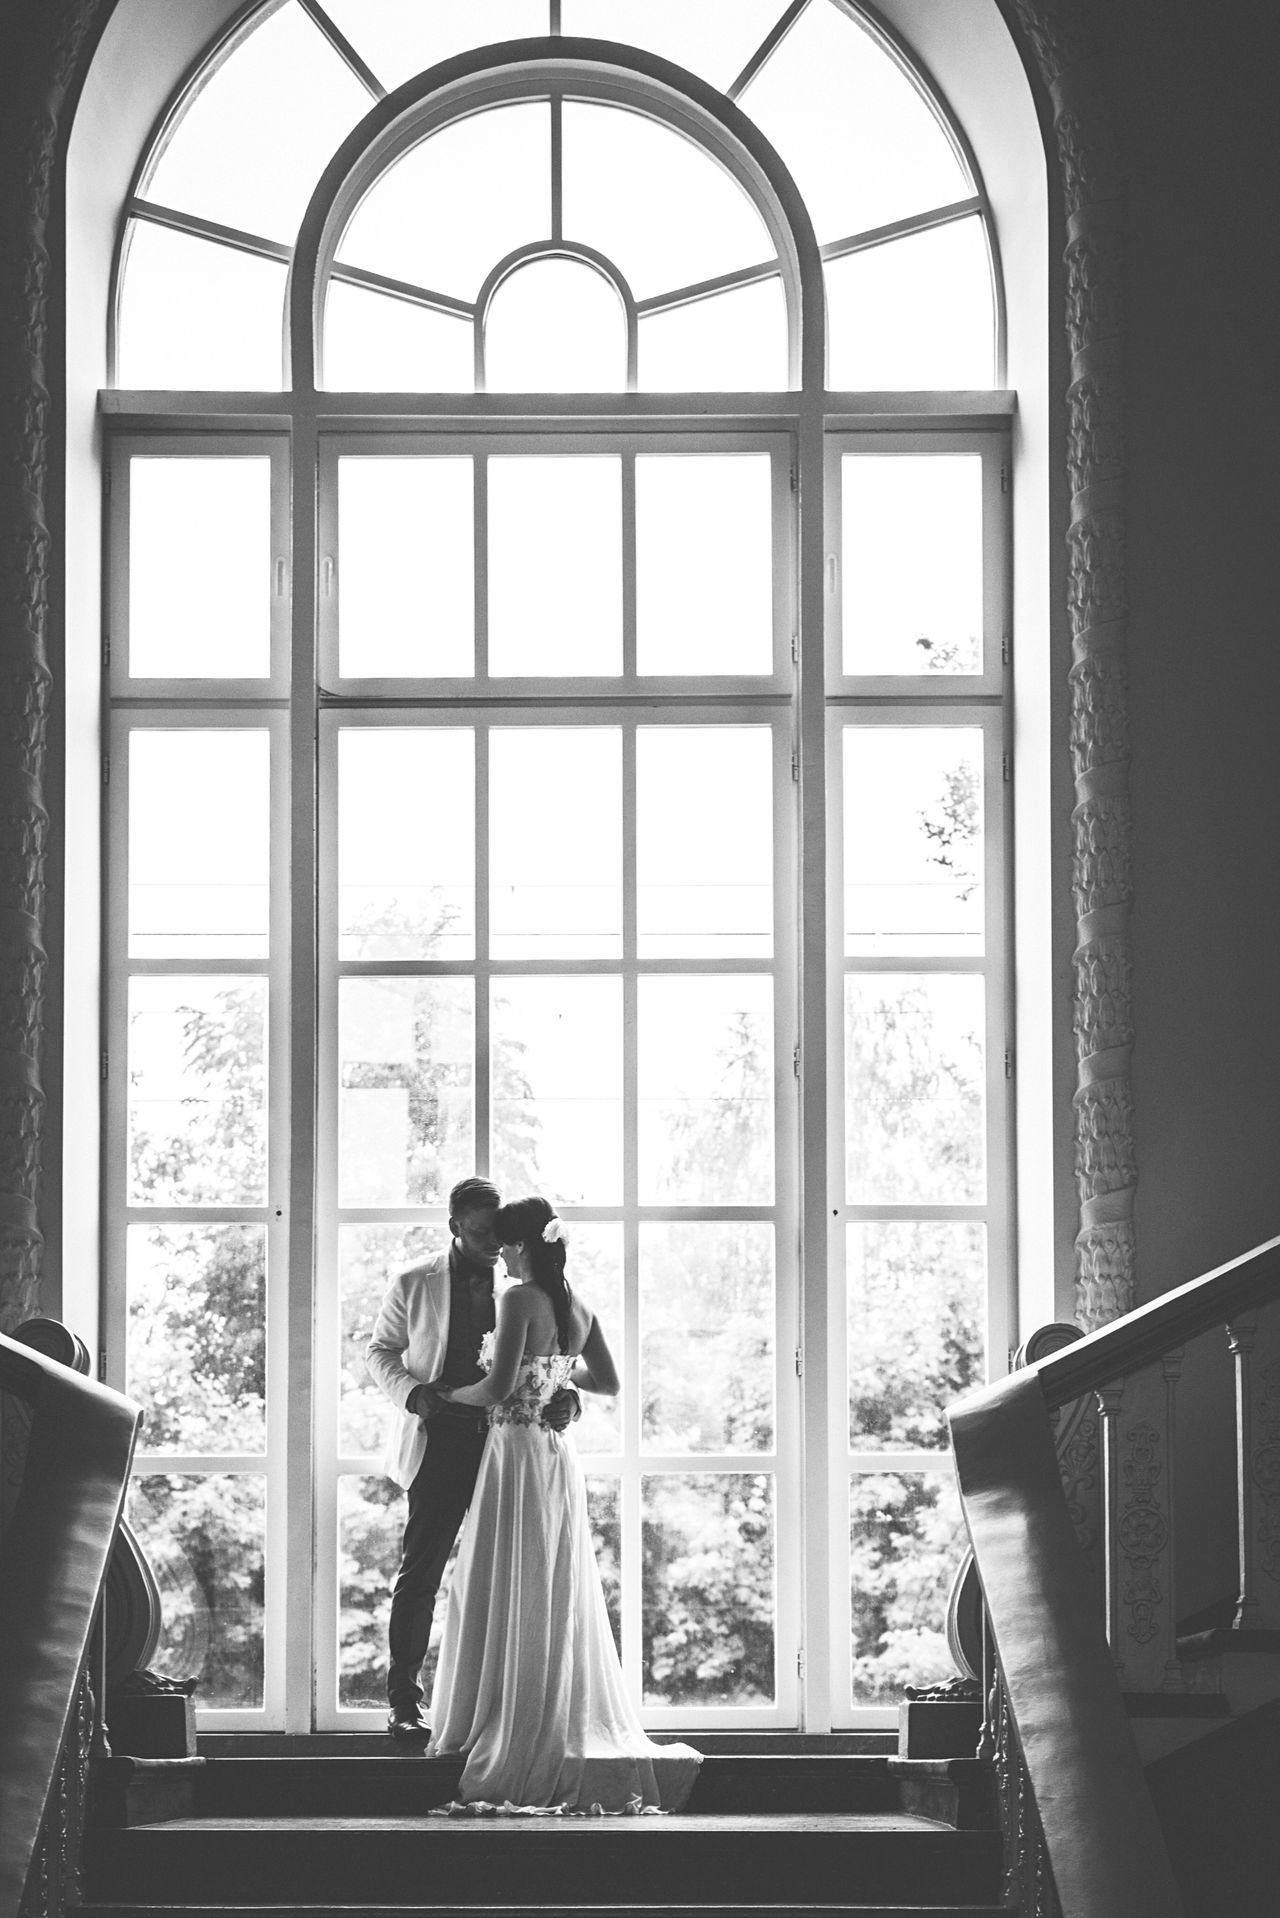 Wedding Wedding Photography Bride Groom Bride And Groom Blackandwhite Black And White Black And White Photography Blackandwhite Photography Wedding Day Wedding Photos Love Big Window